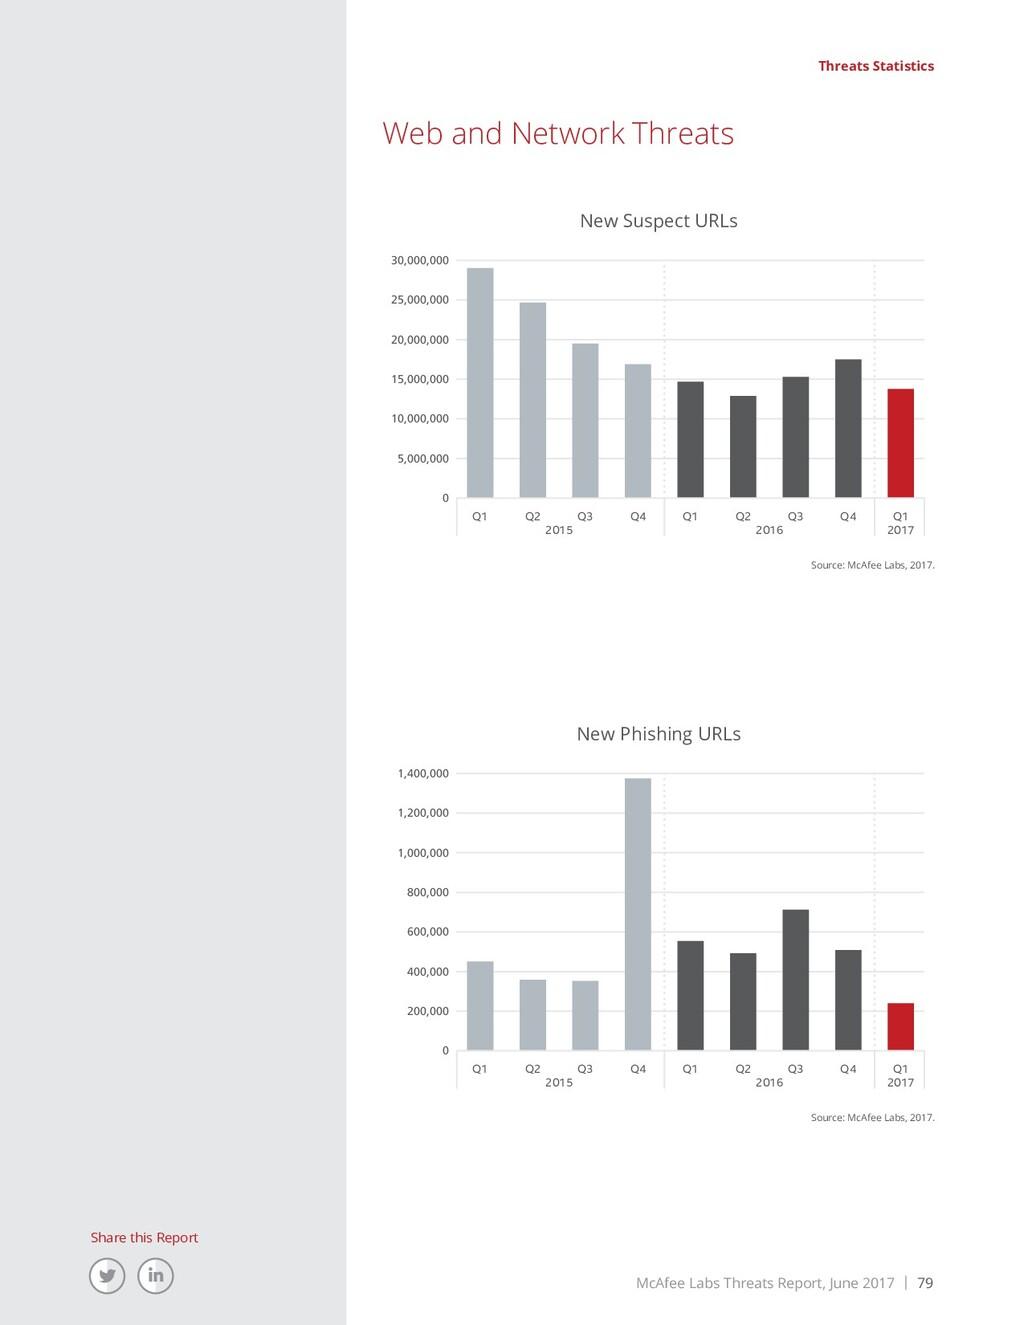 McAfee Labs Threats Report, June 2017 | 79 Shar...